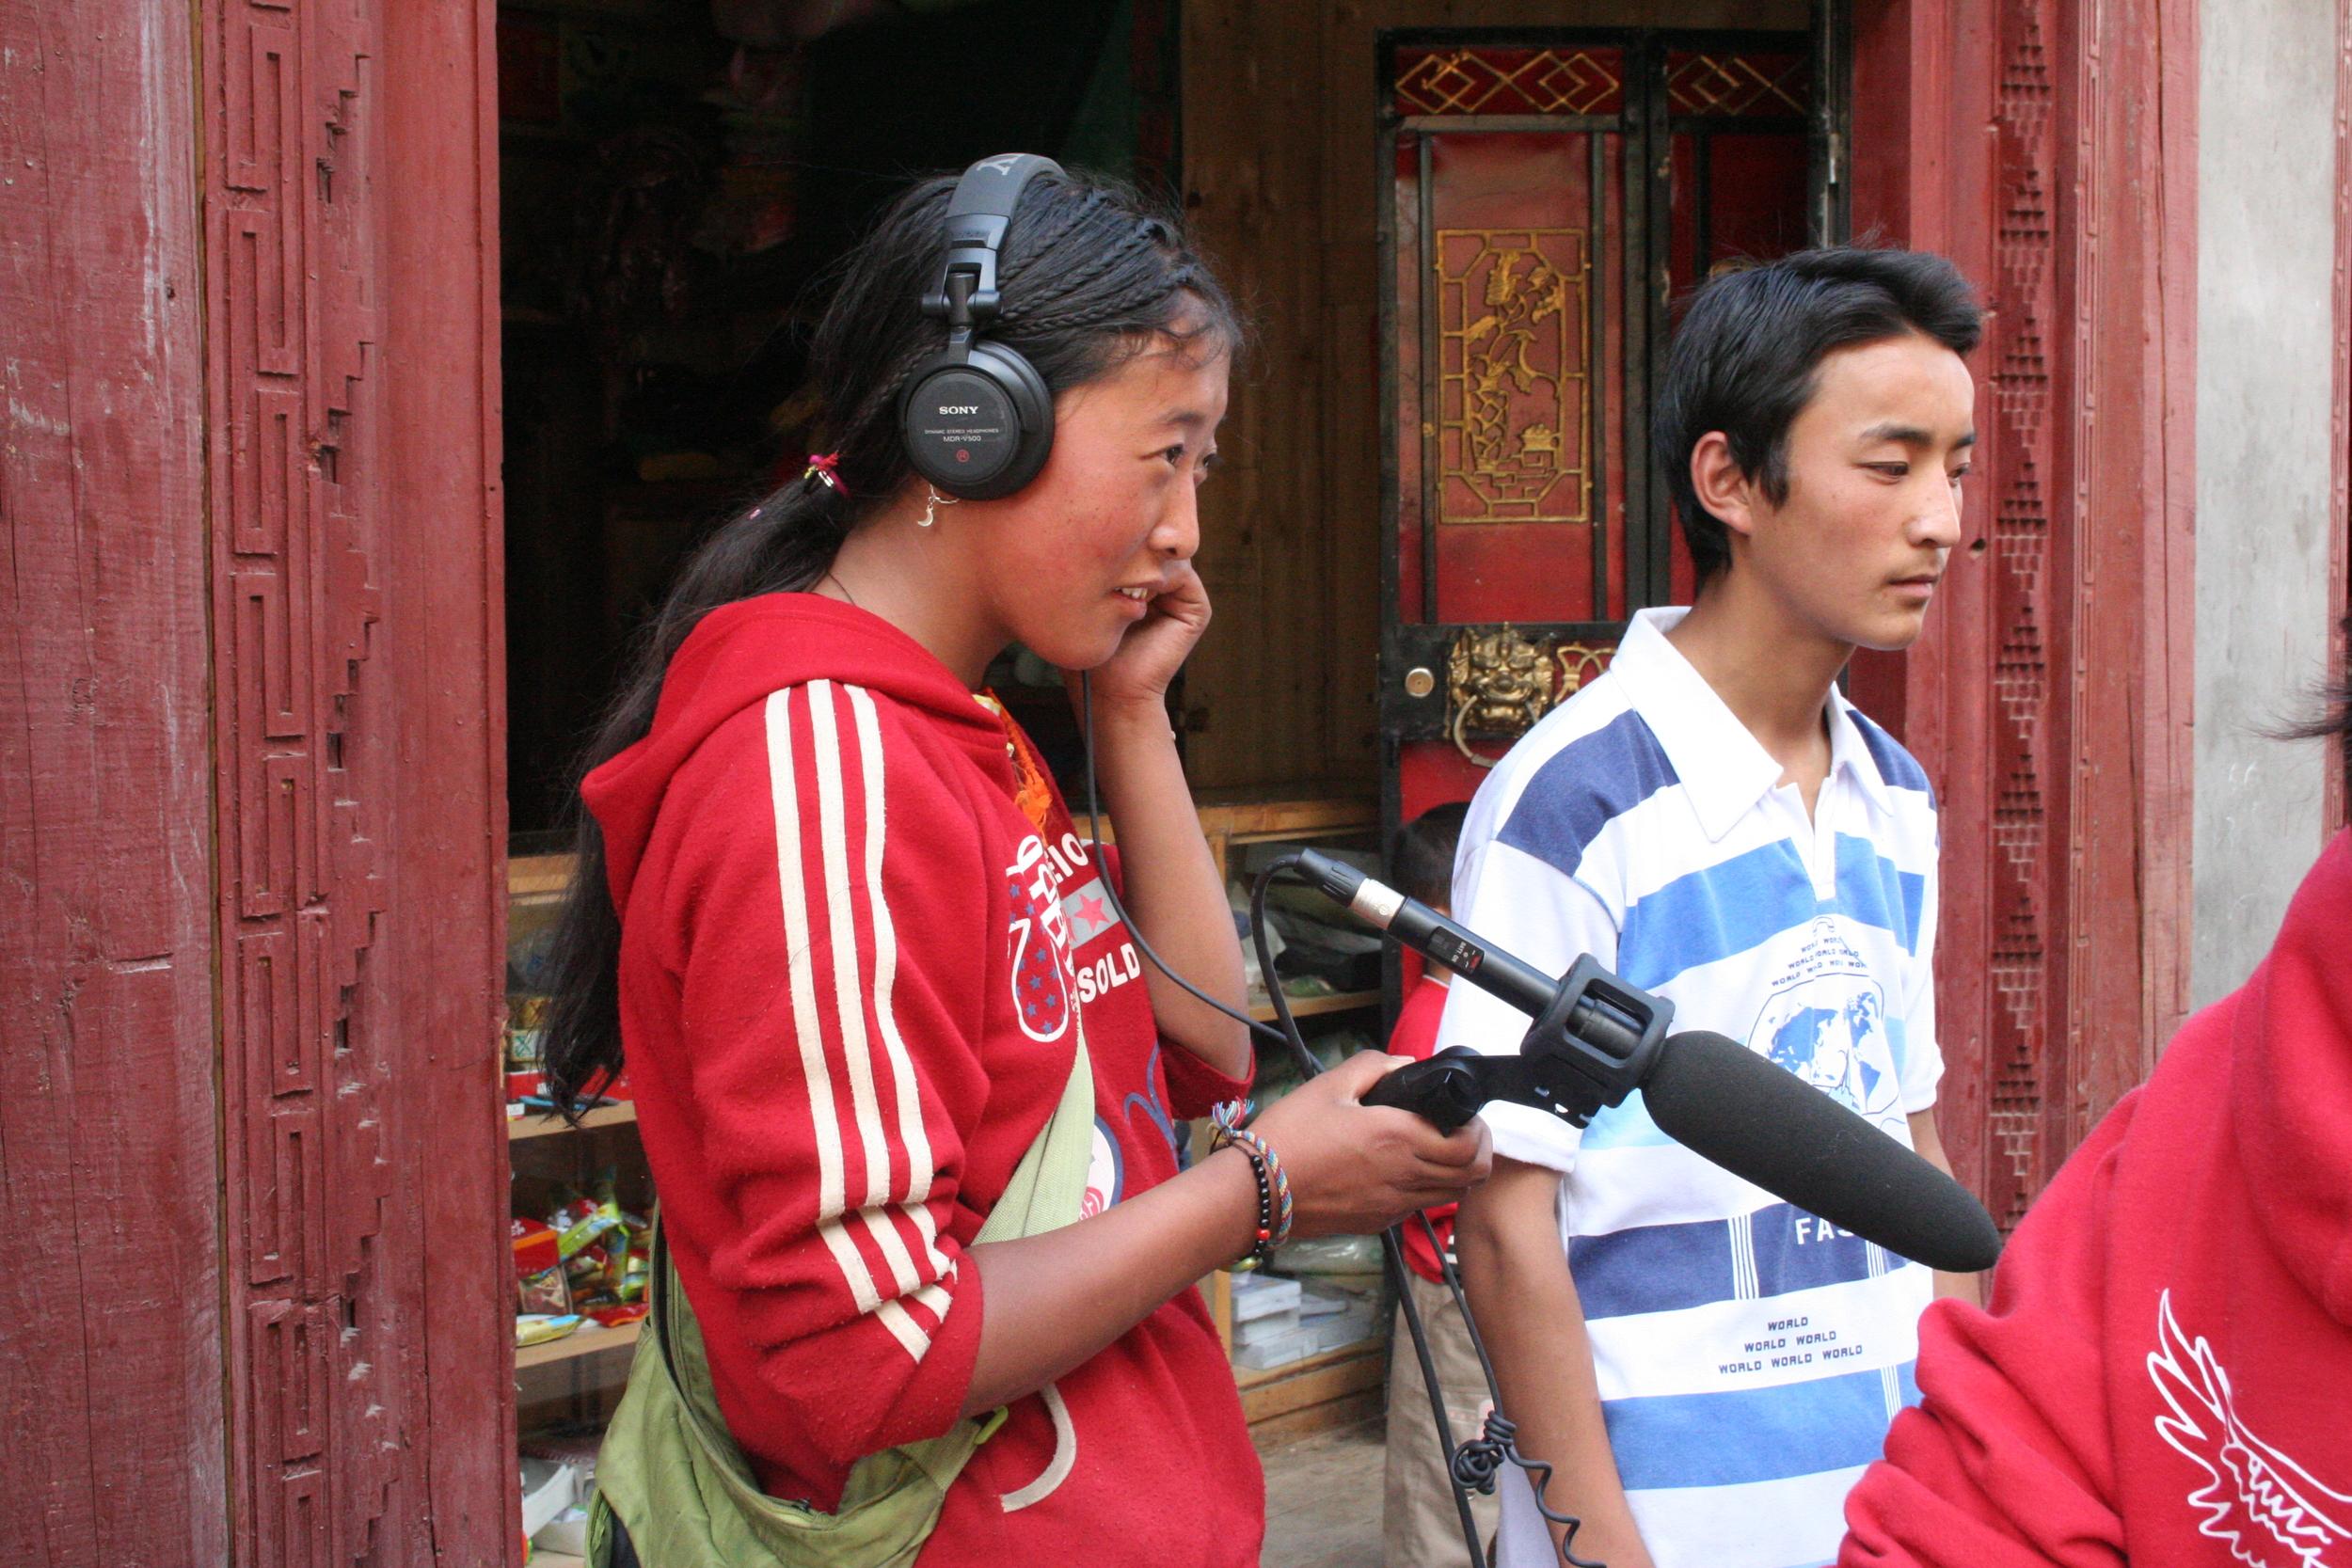 Tsering Drolkar